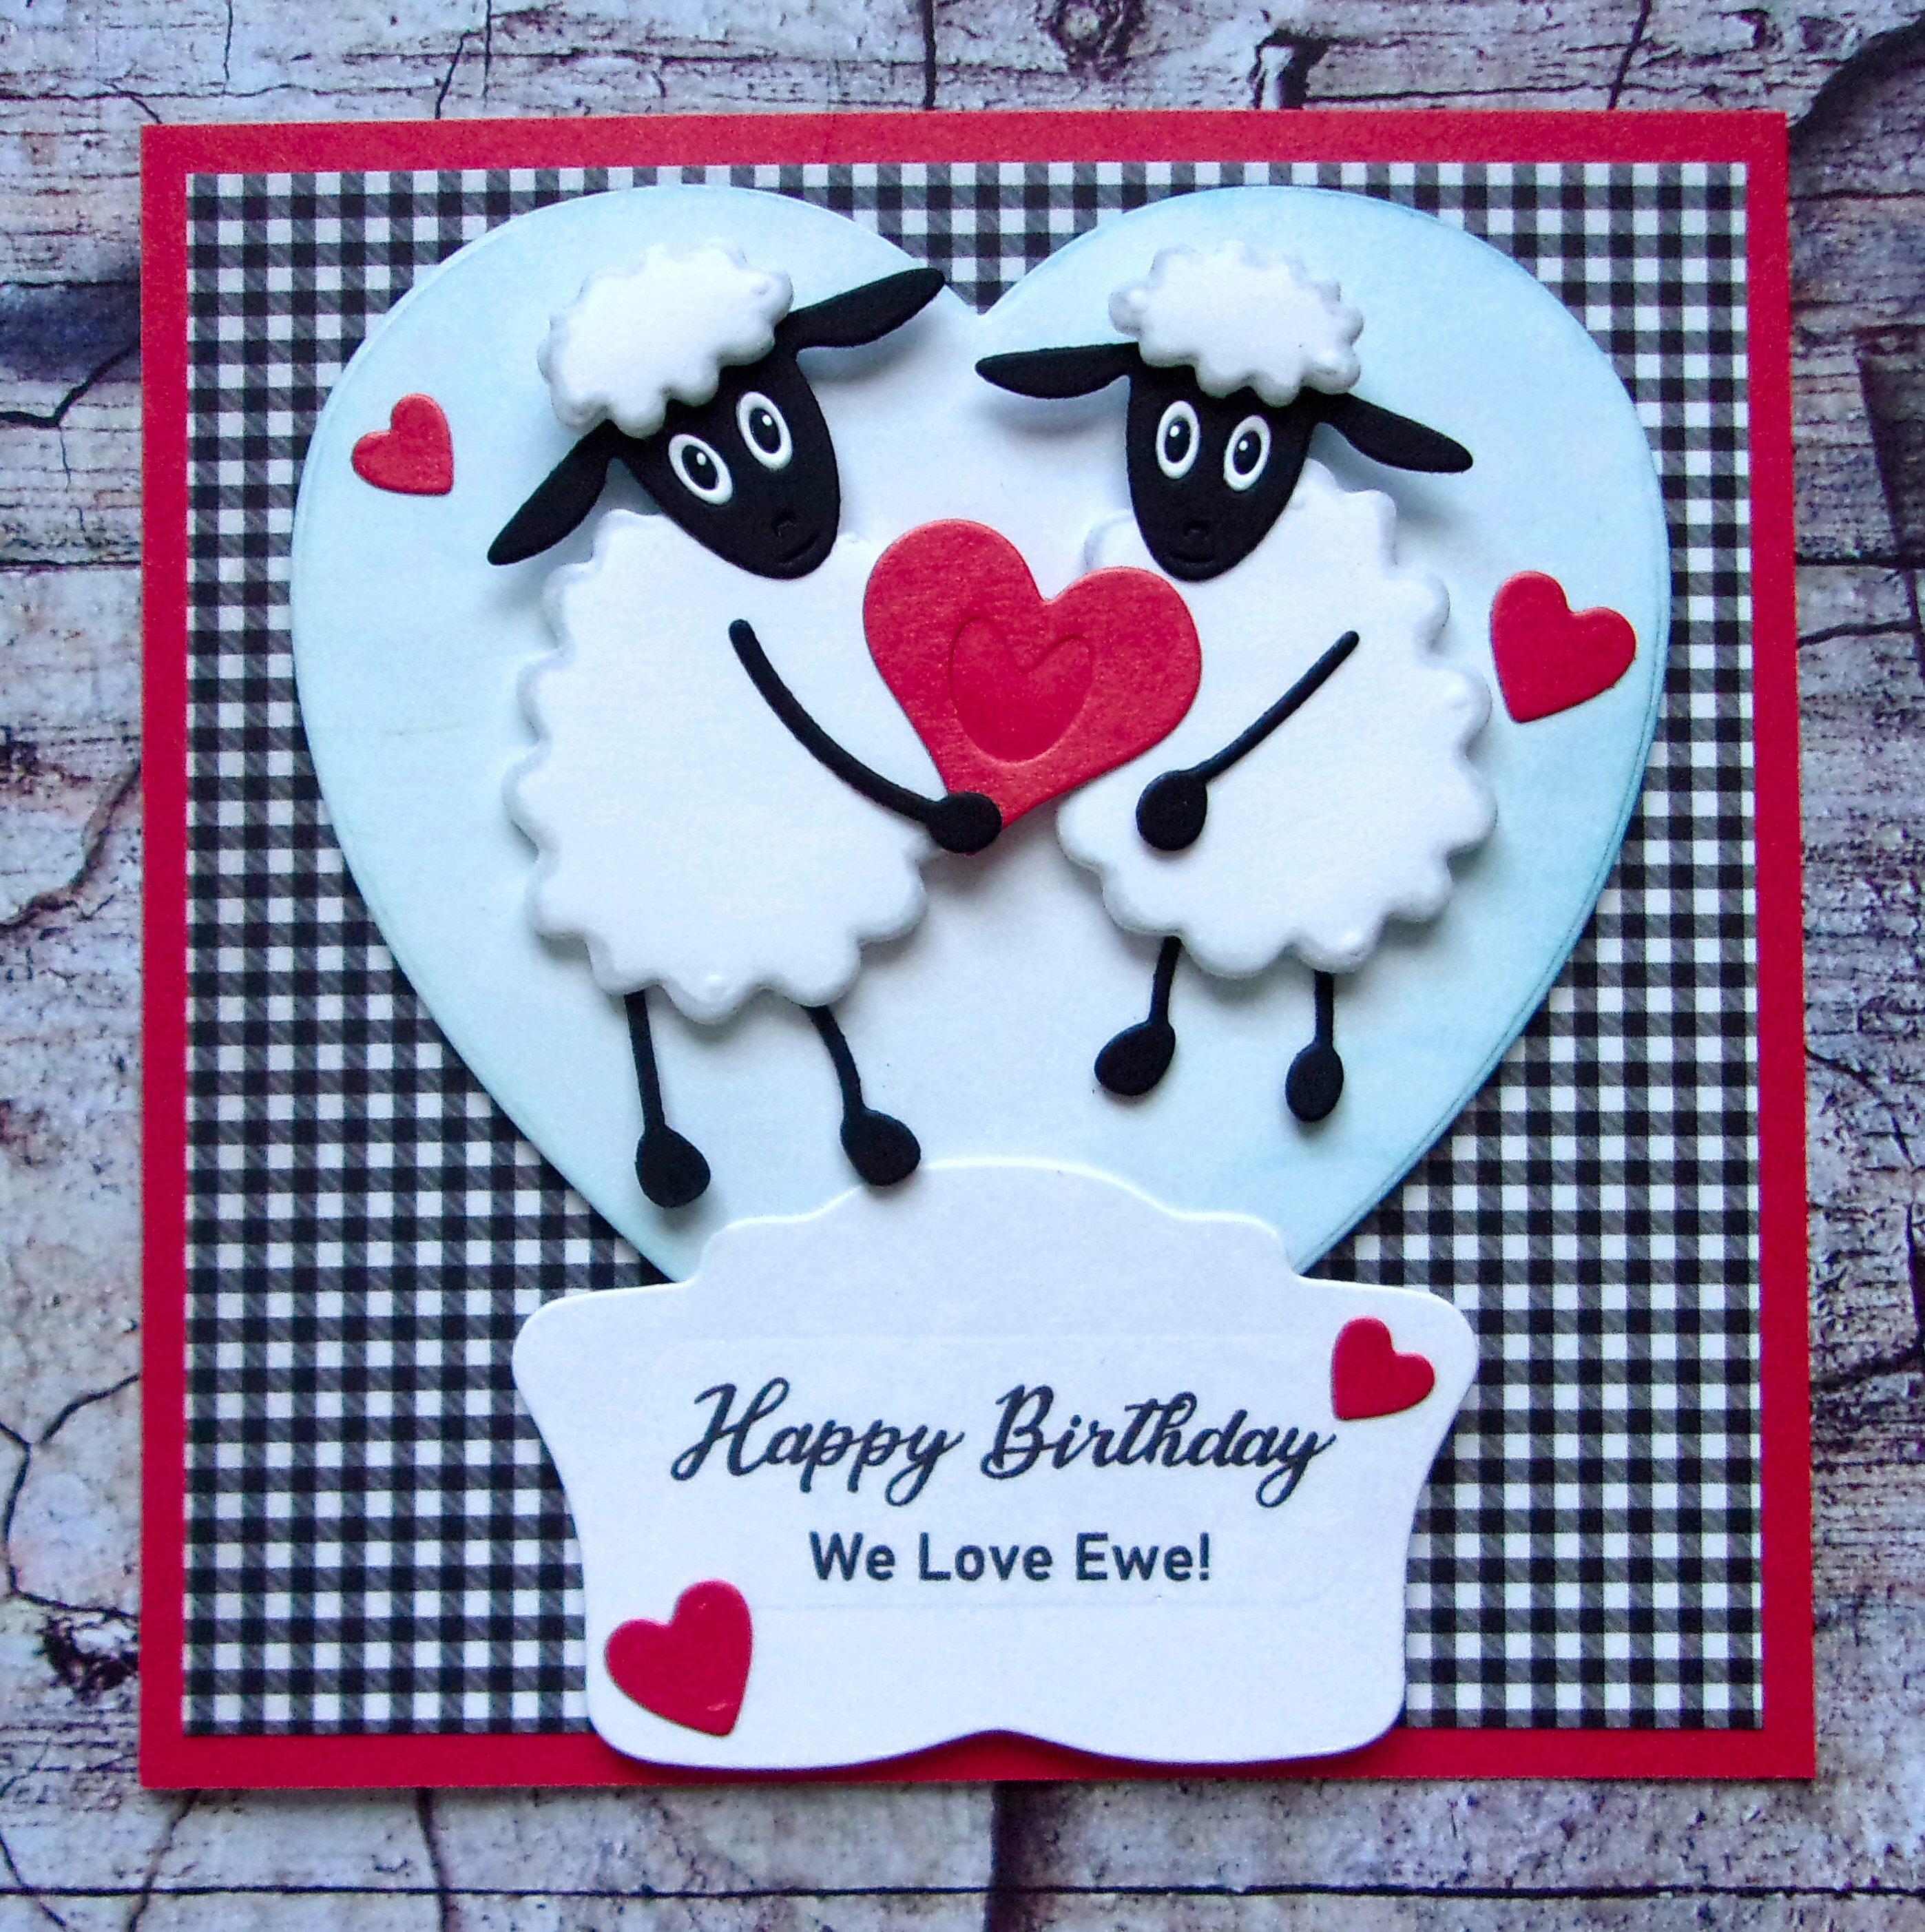 Valentine die Cutting Dies 2019 Sheep Hand By Hand Love Wedding Metal Cutting Die Cuts For Card Making